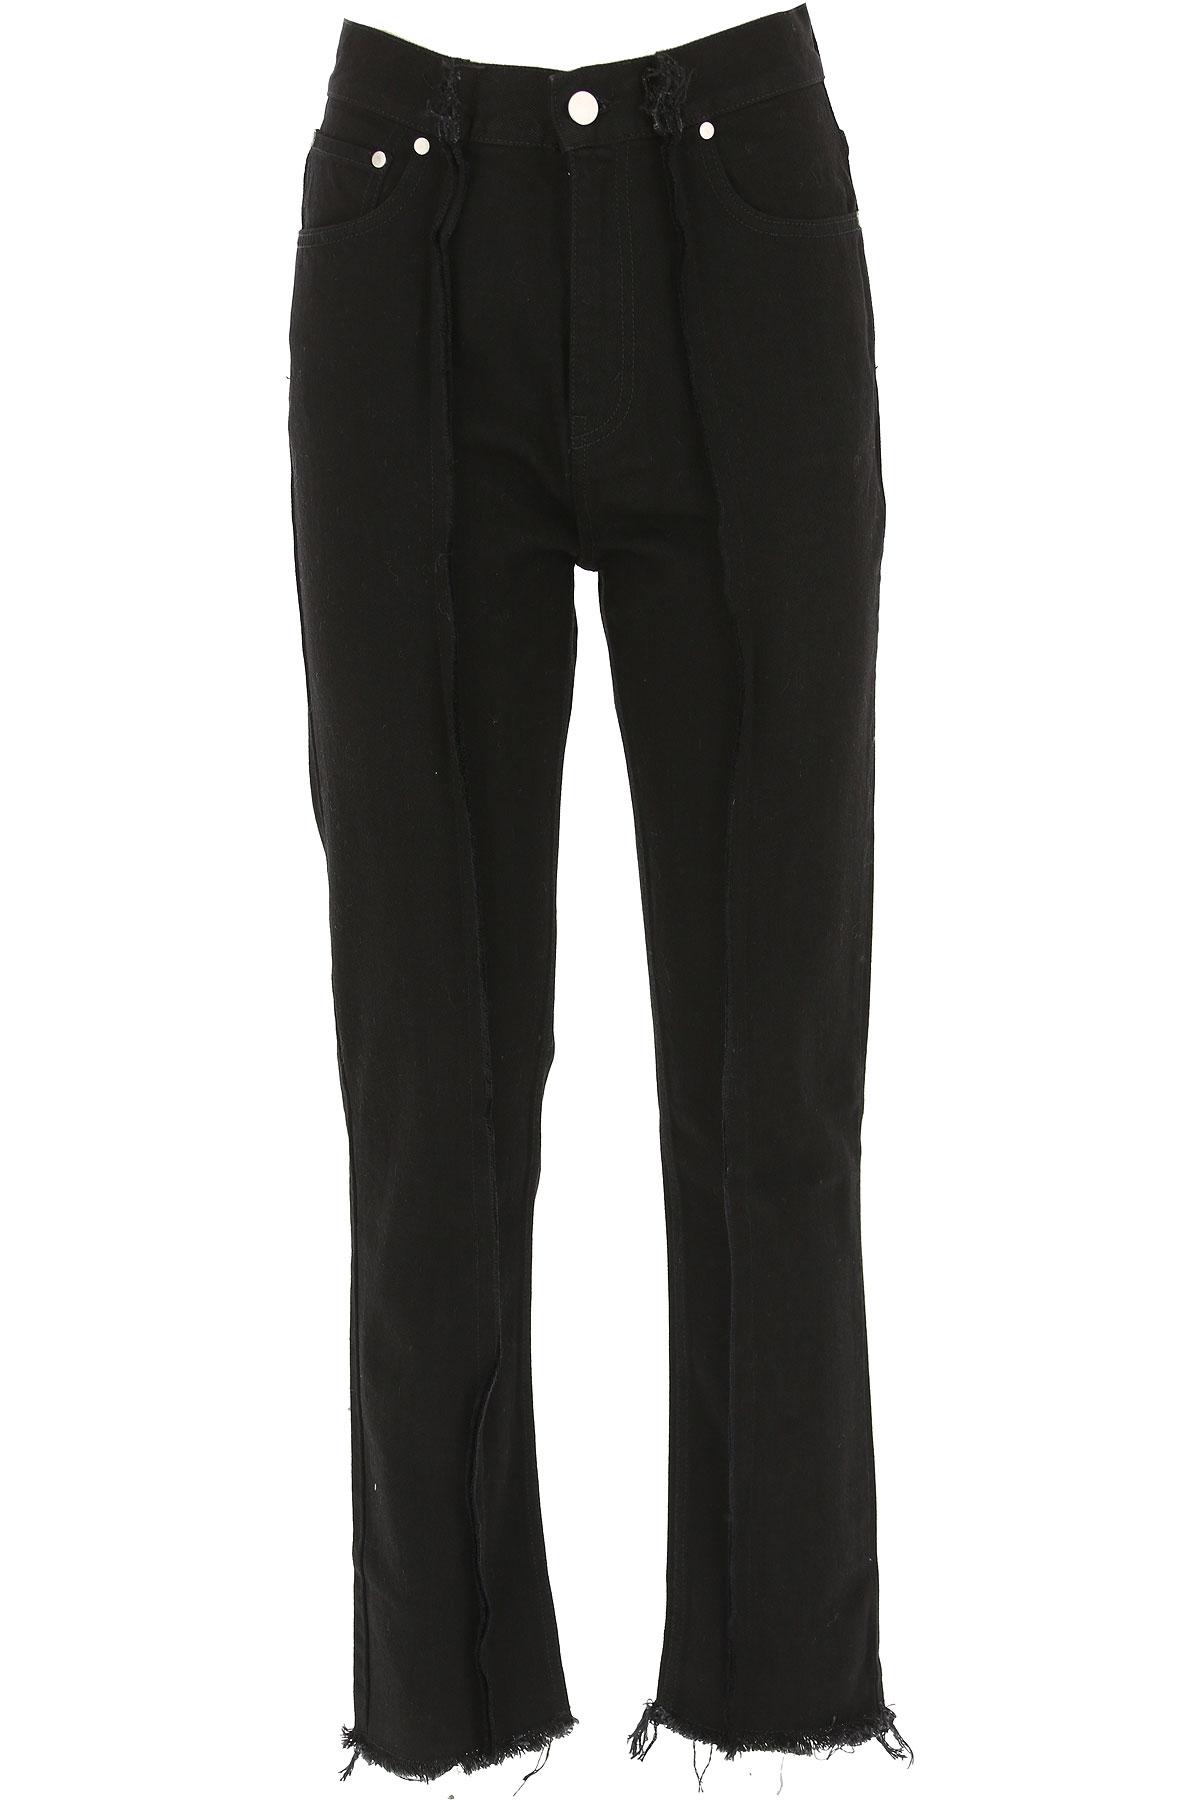 Image of Rokh Jeans, Black, Cotton, 2017, 2 4